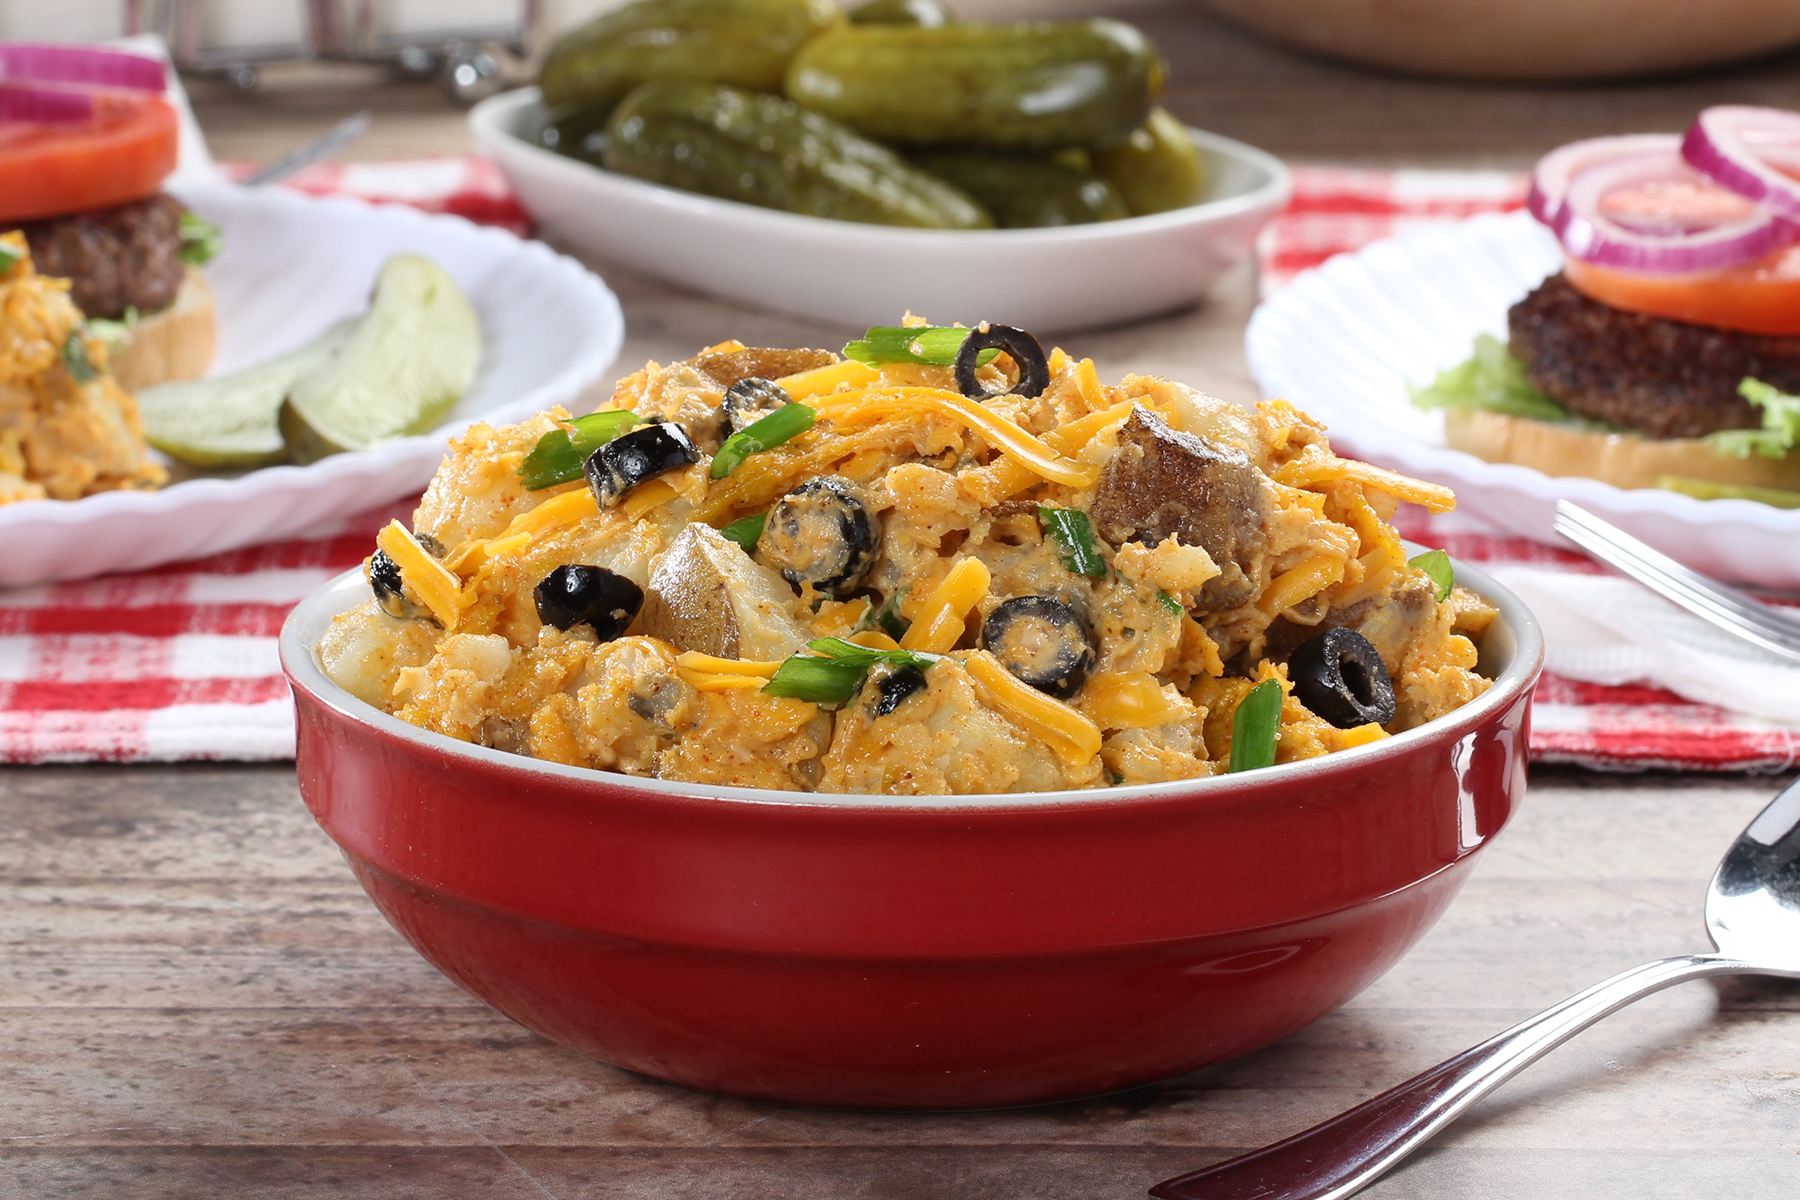 07-01-19_Taco_Potato_Salad wmv